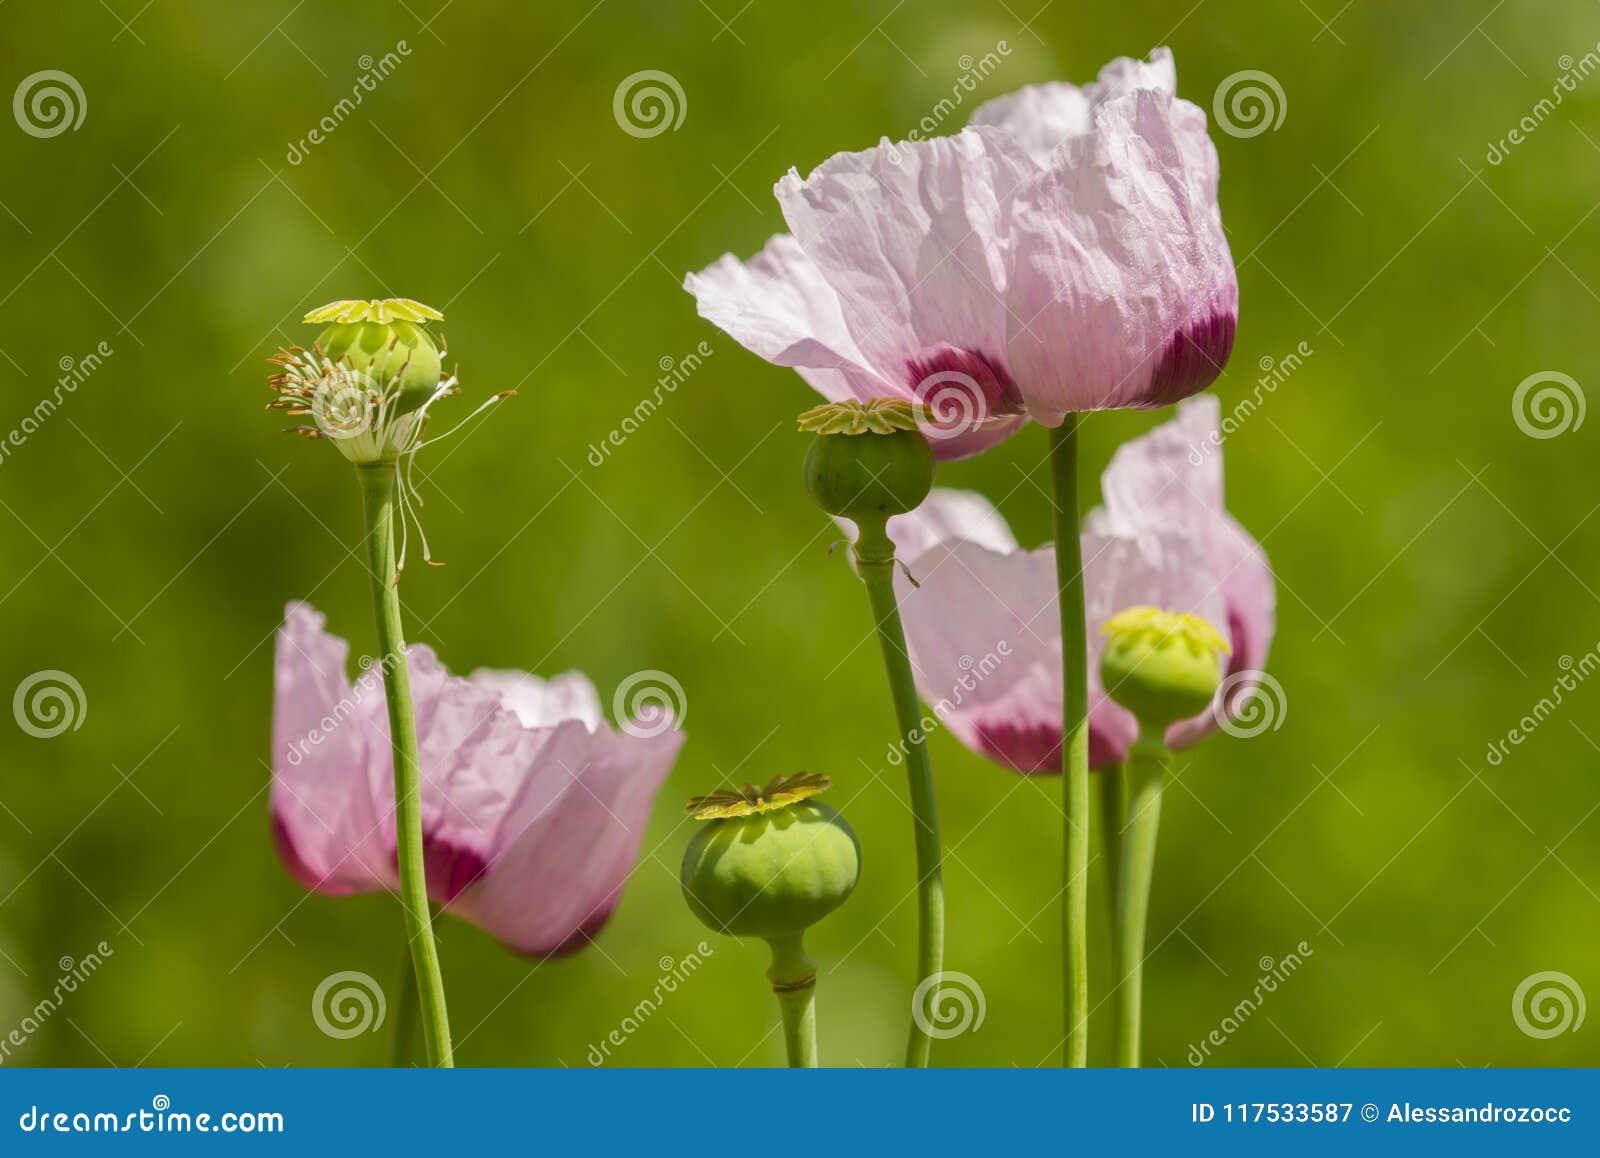 Opium Poppy Flowers Papaver Somniferum Stock Image Image Of